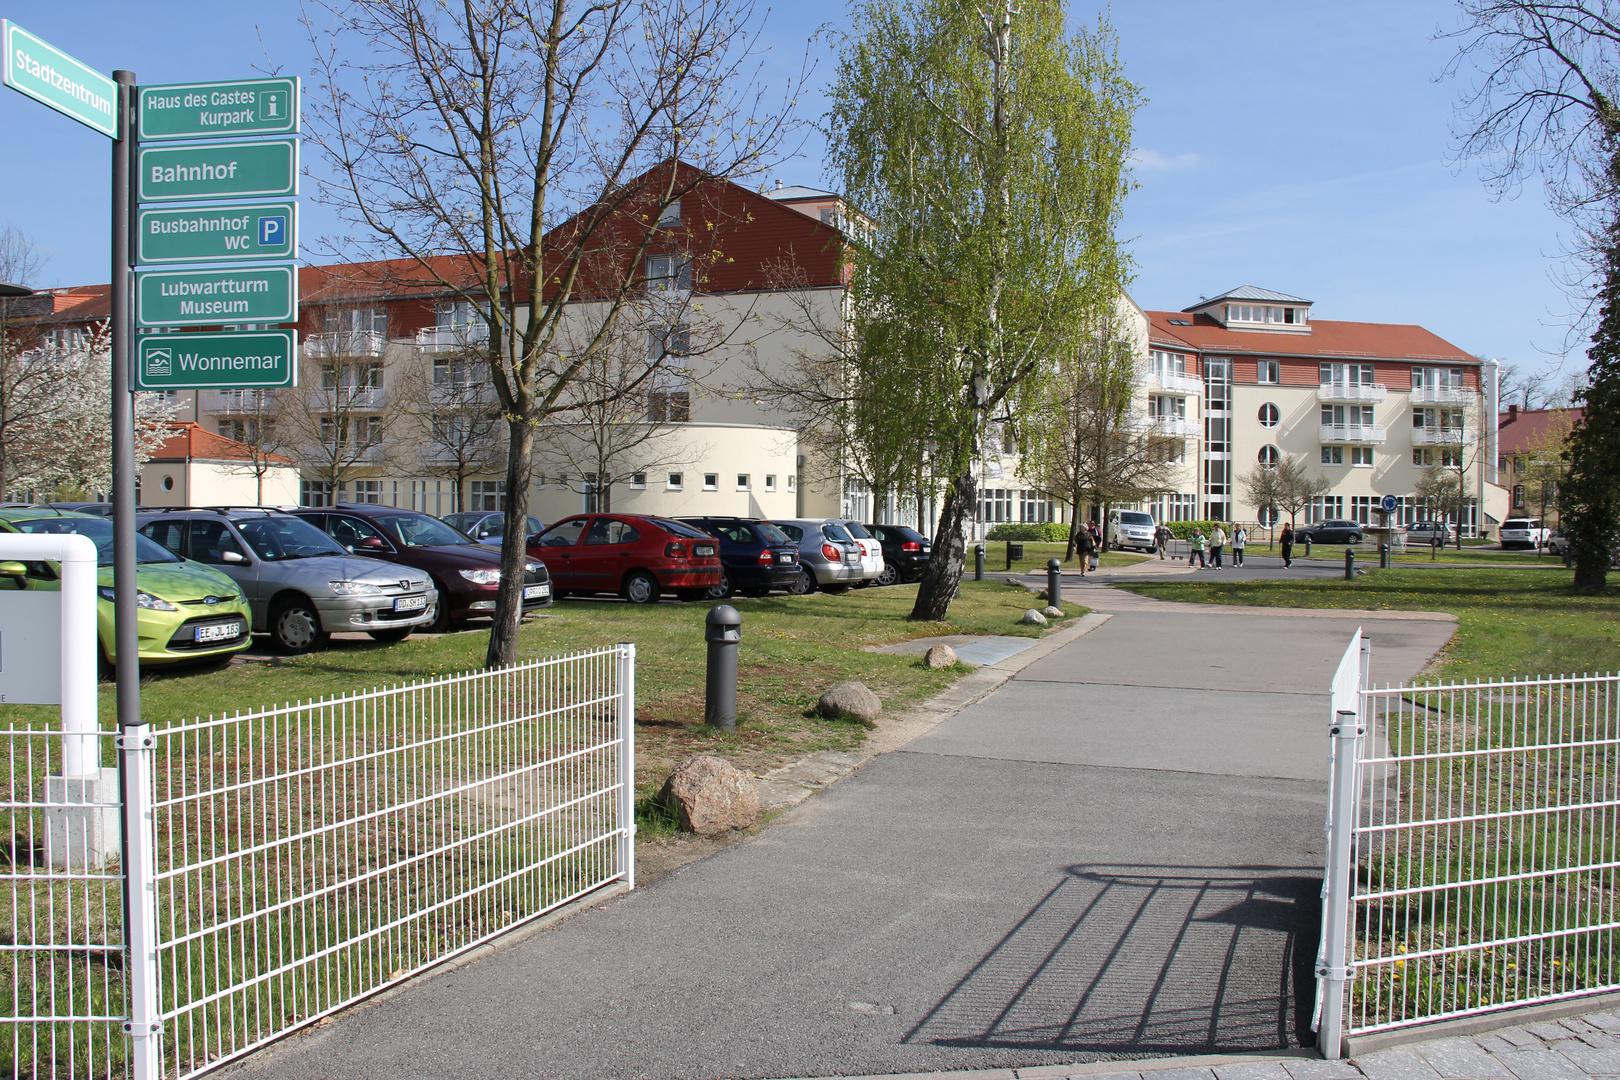 Einfahrt Fontana Klinik Bad Liebenwerda Foto & Bild